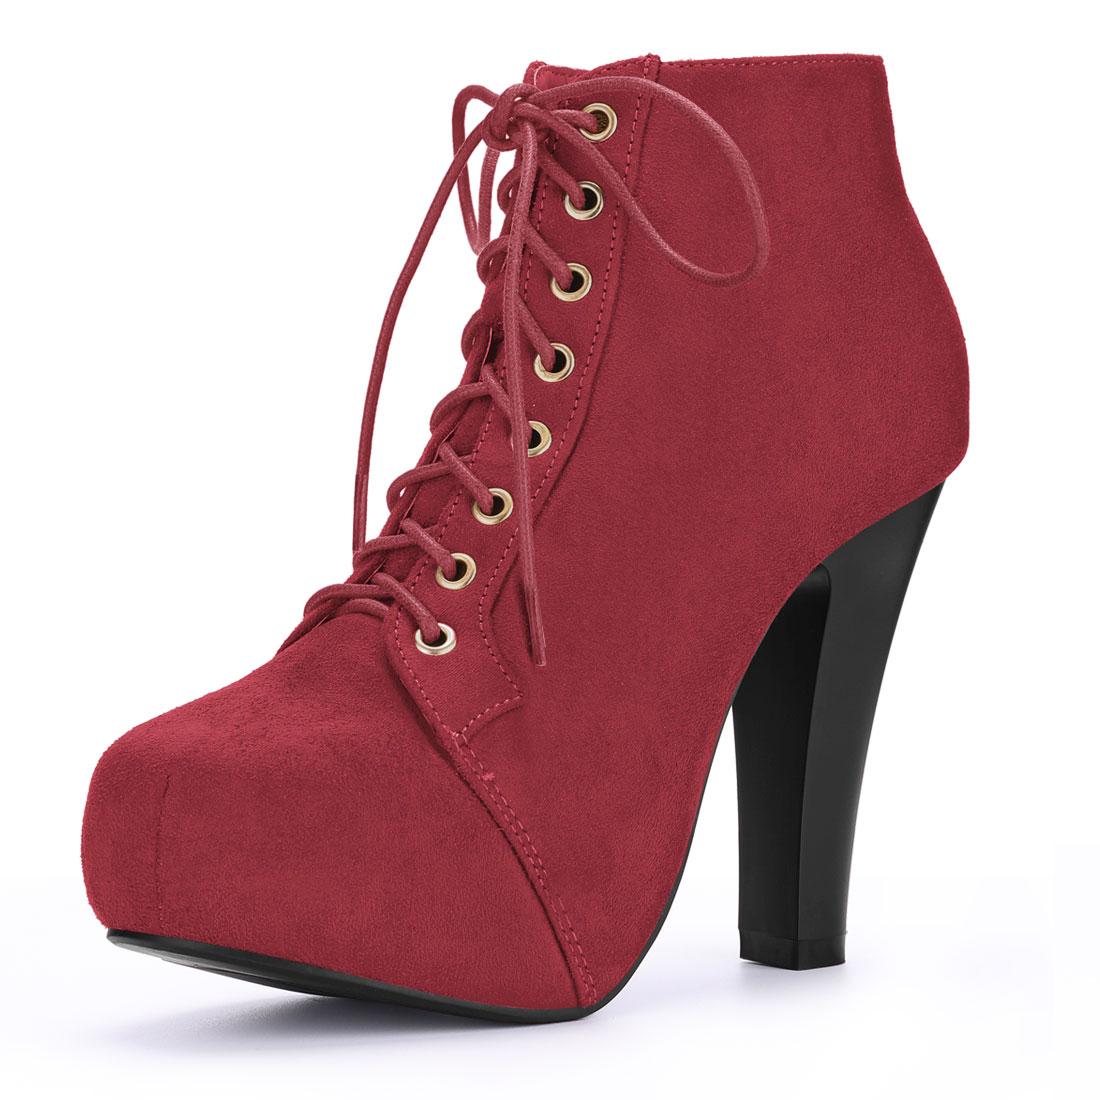 Women Round Toe High Heel Platform Lace Up Booties Red US 6